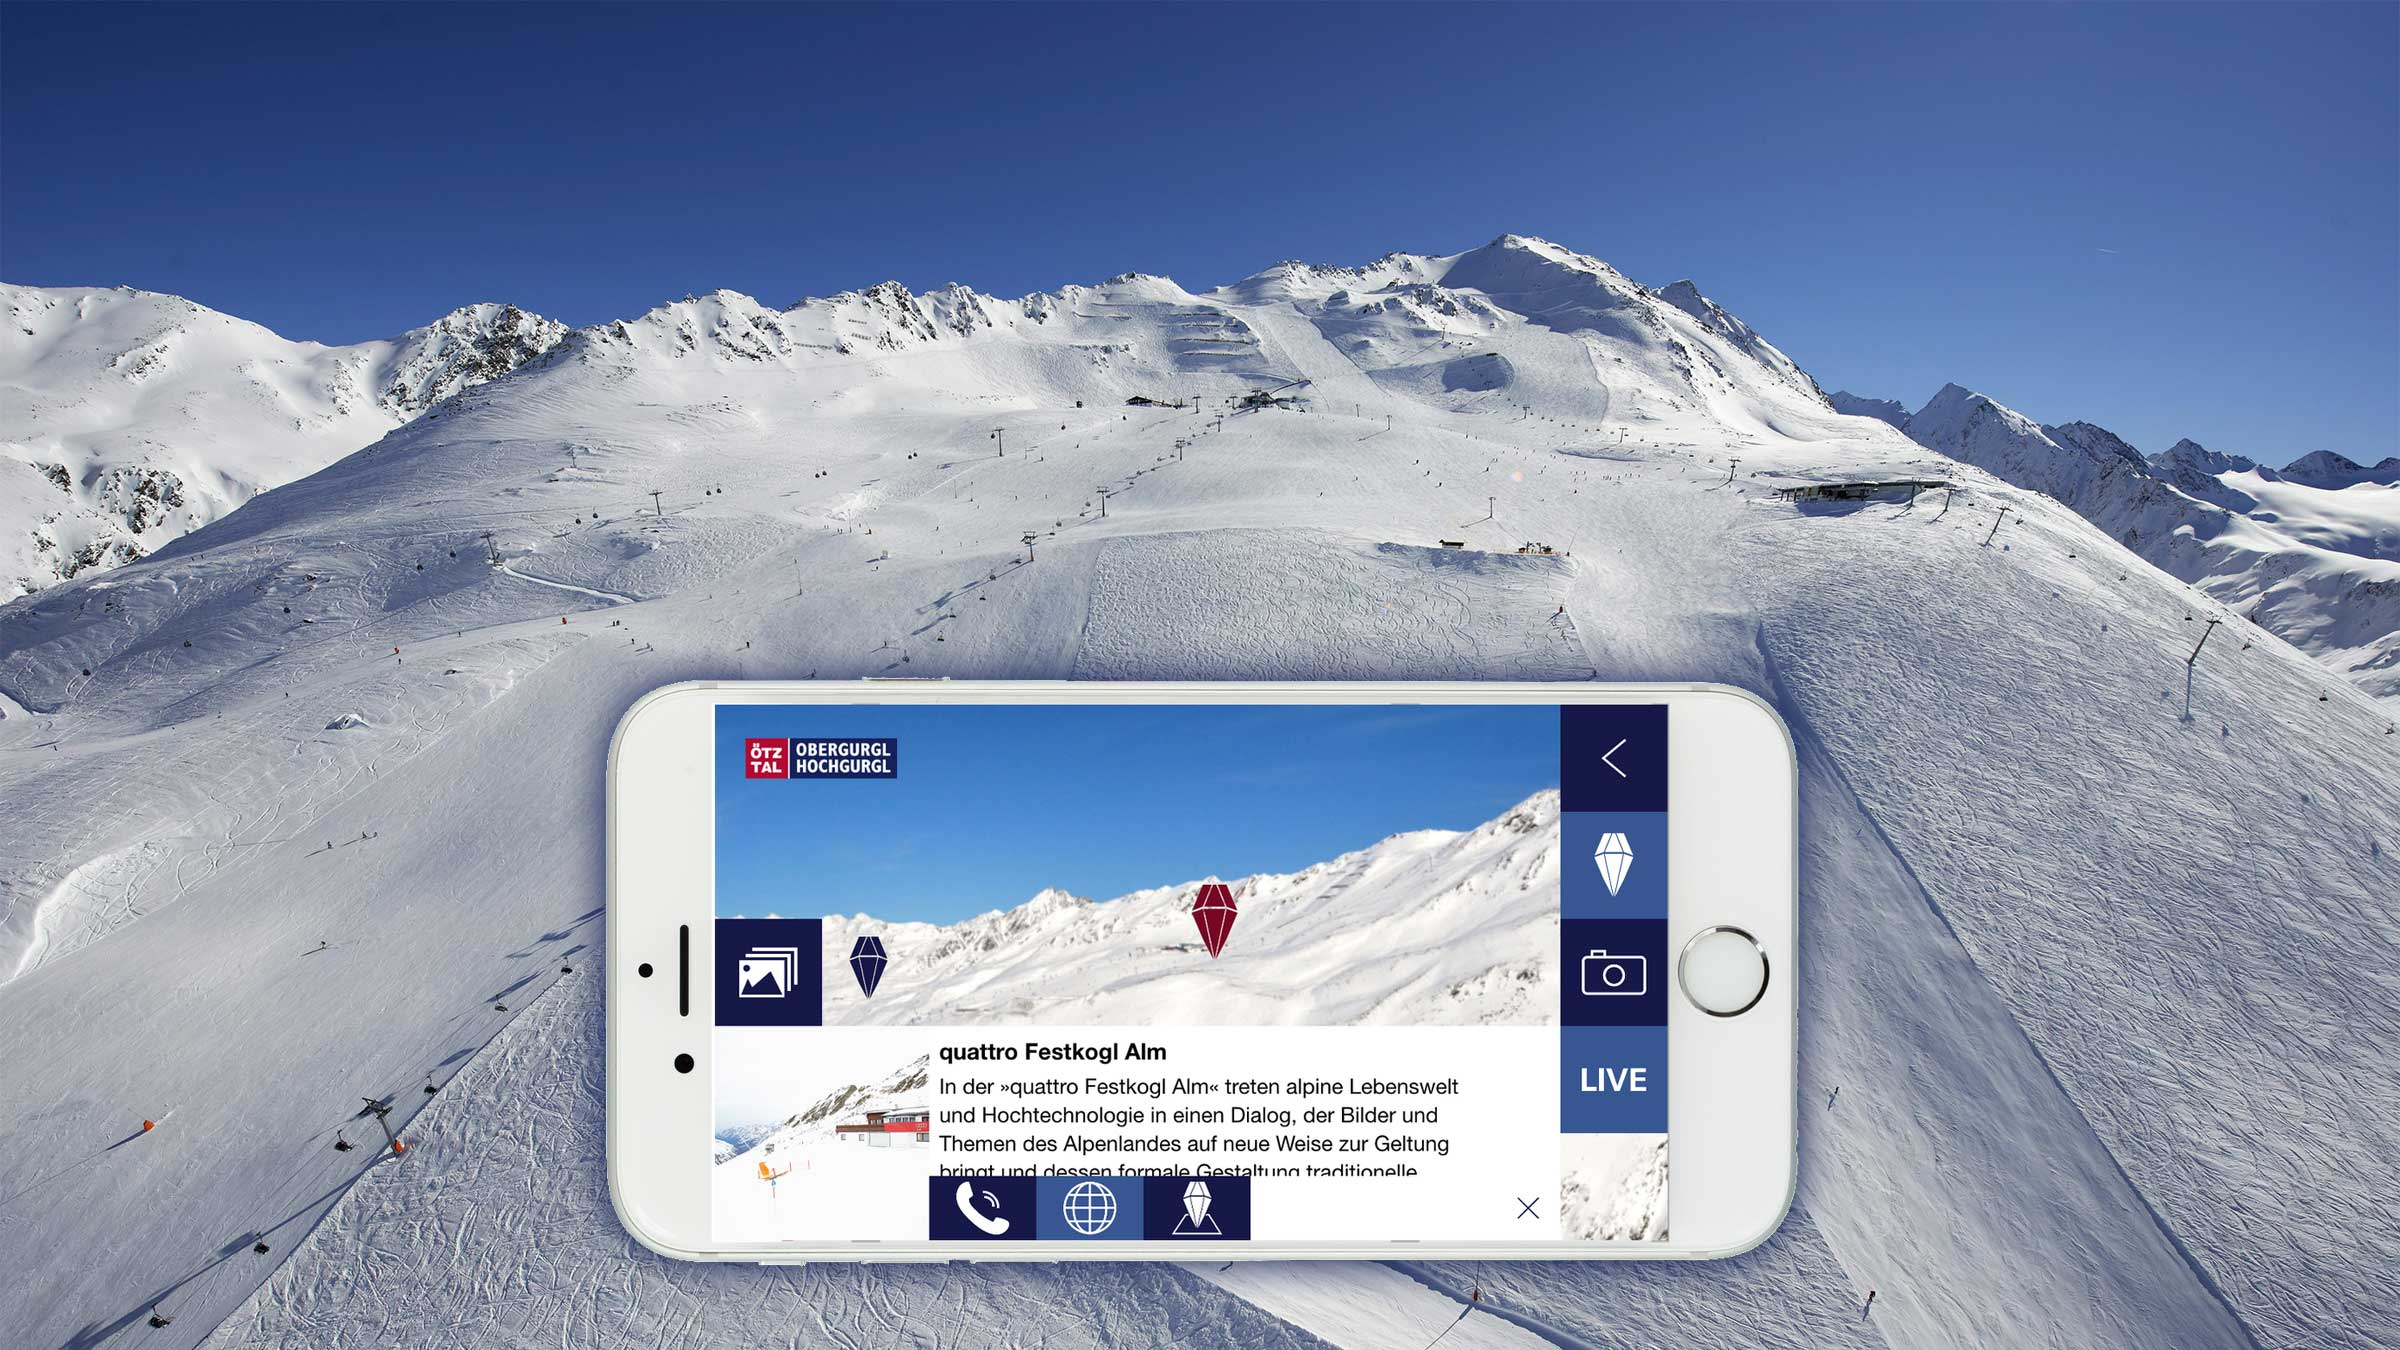 Festkogl und Mountain Navigator App - Obergurgl-Hochgurgl, Ötztal, Tirol